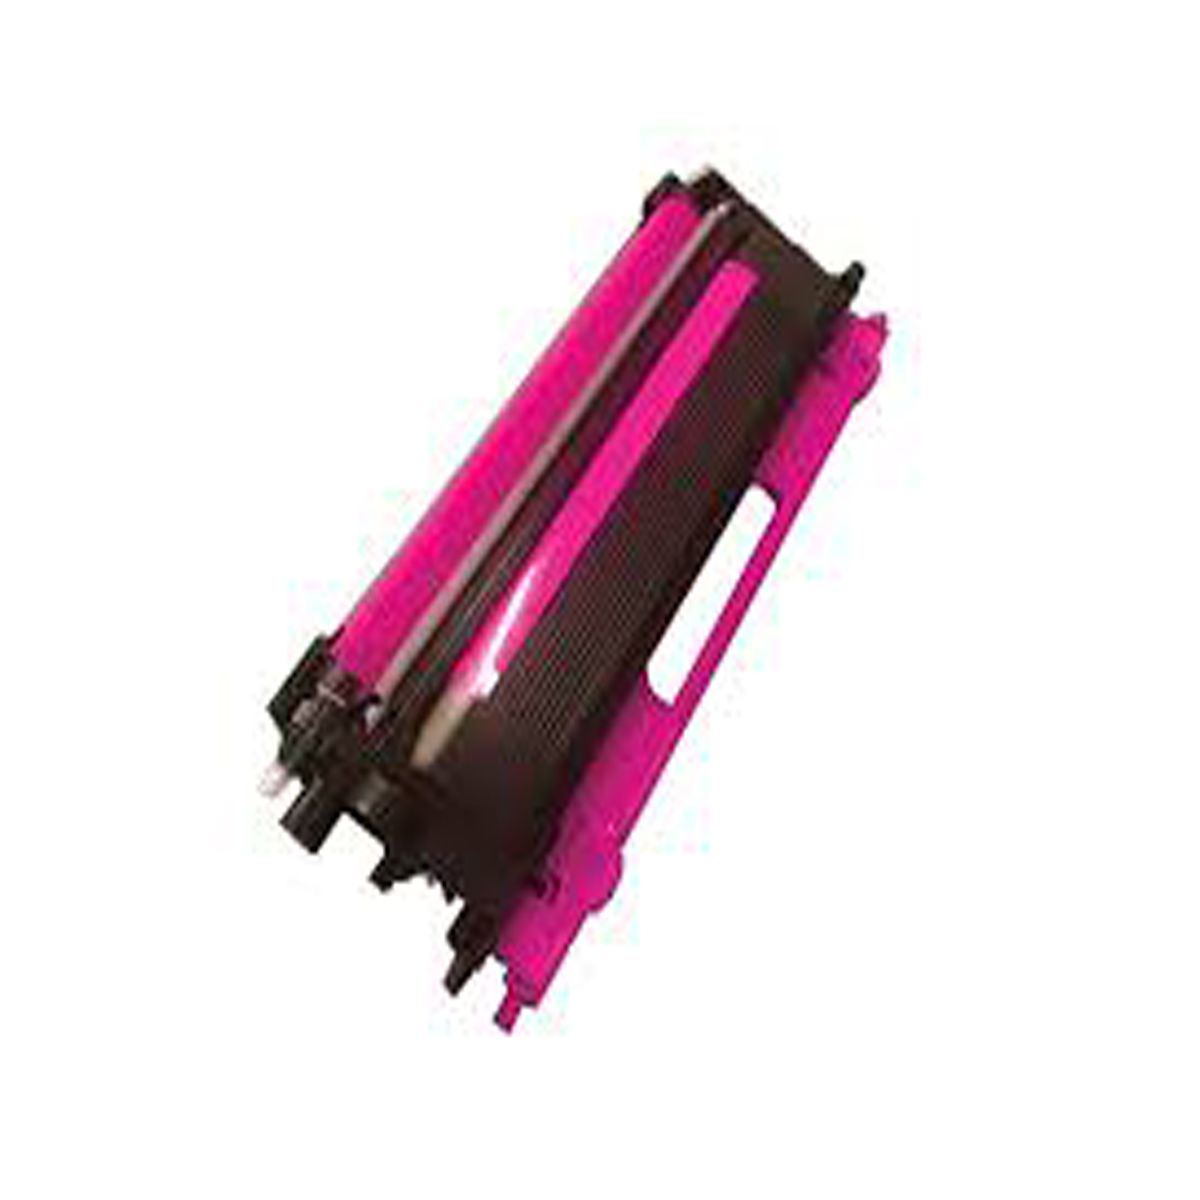 Toner TN115 TN135 TN155 TN175 TN195 - DCP9040CN MFC9440CN HL4040CDN - Magenta - 4K